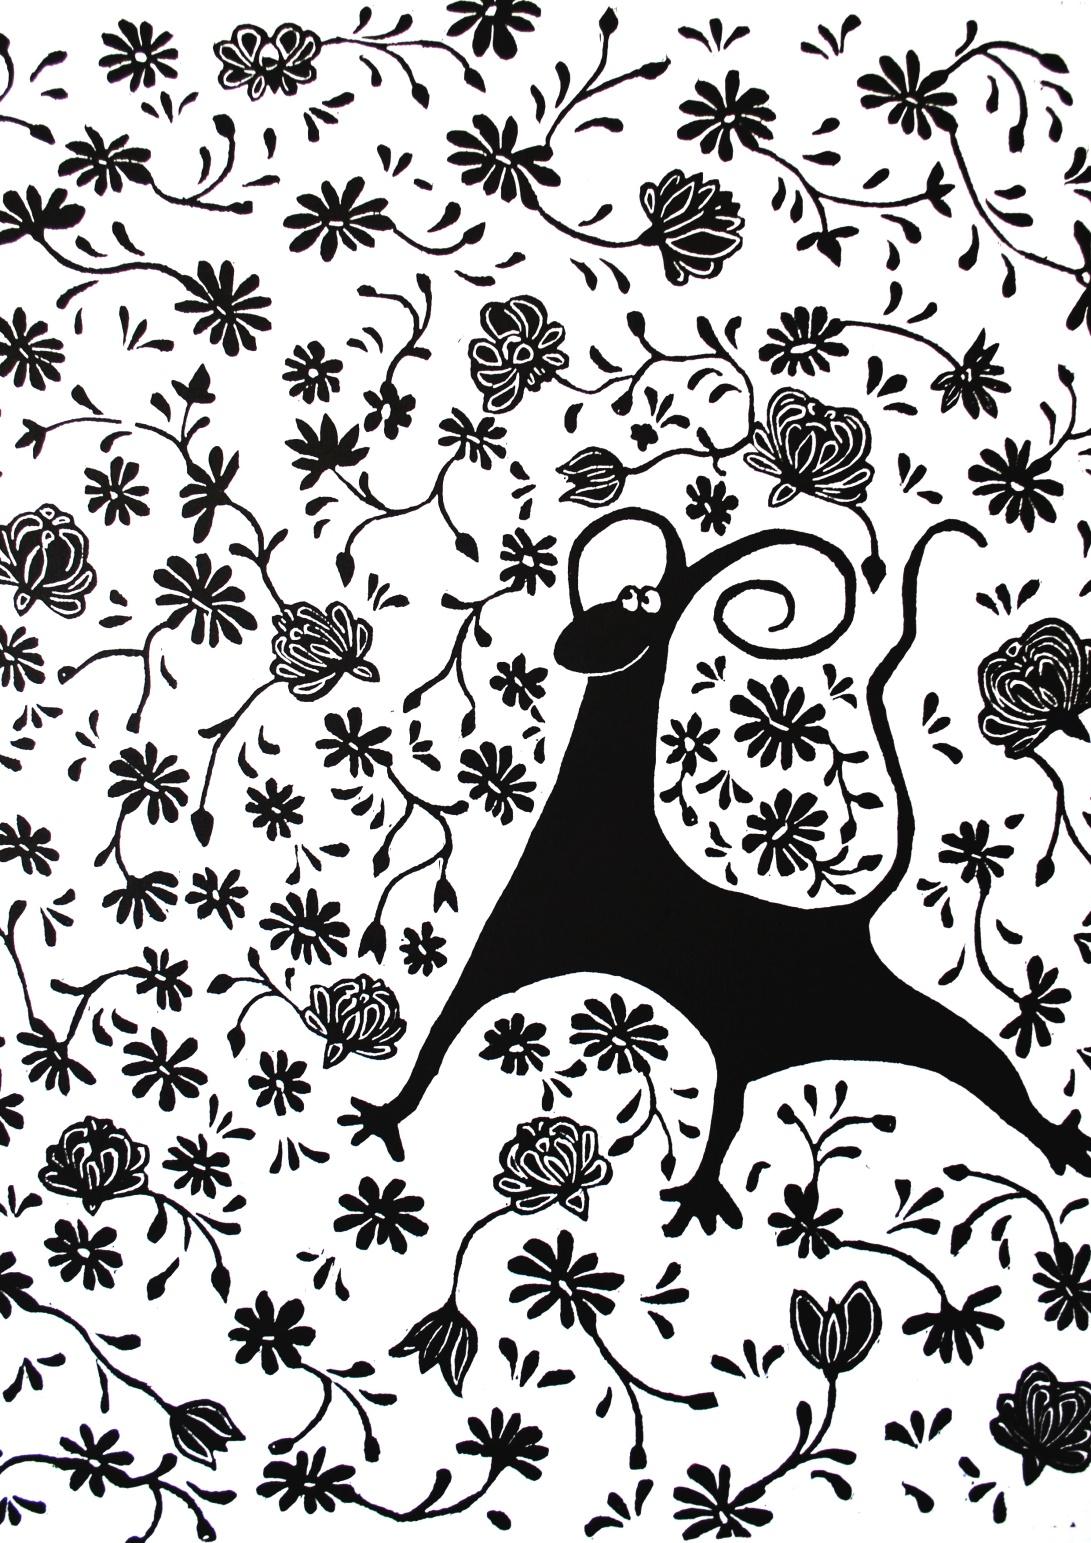 genevieve guadalupe. teodoro. 51x41,5cm. xilography. 2016.